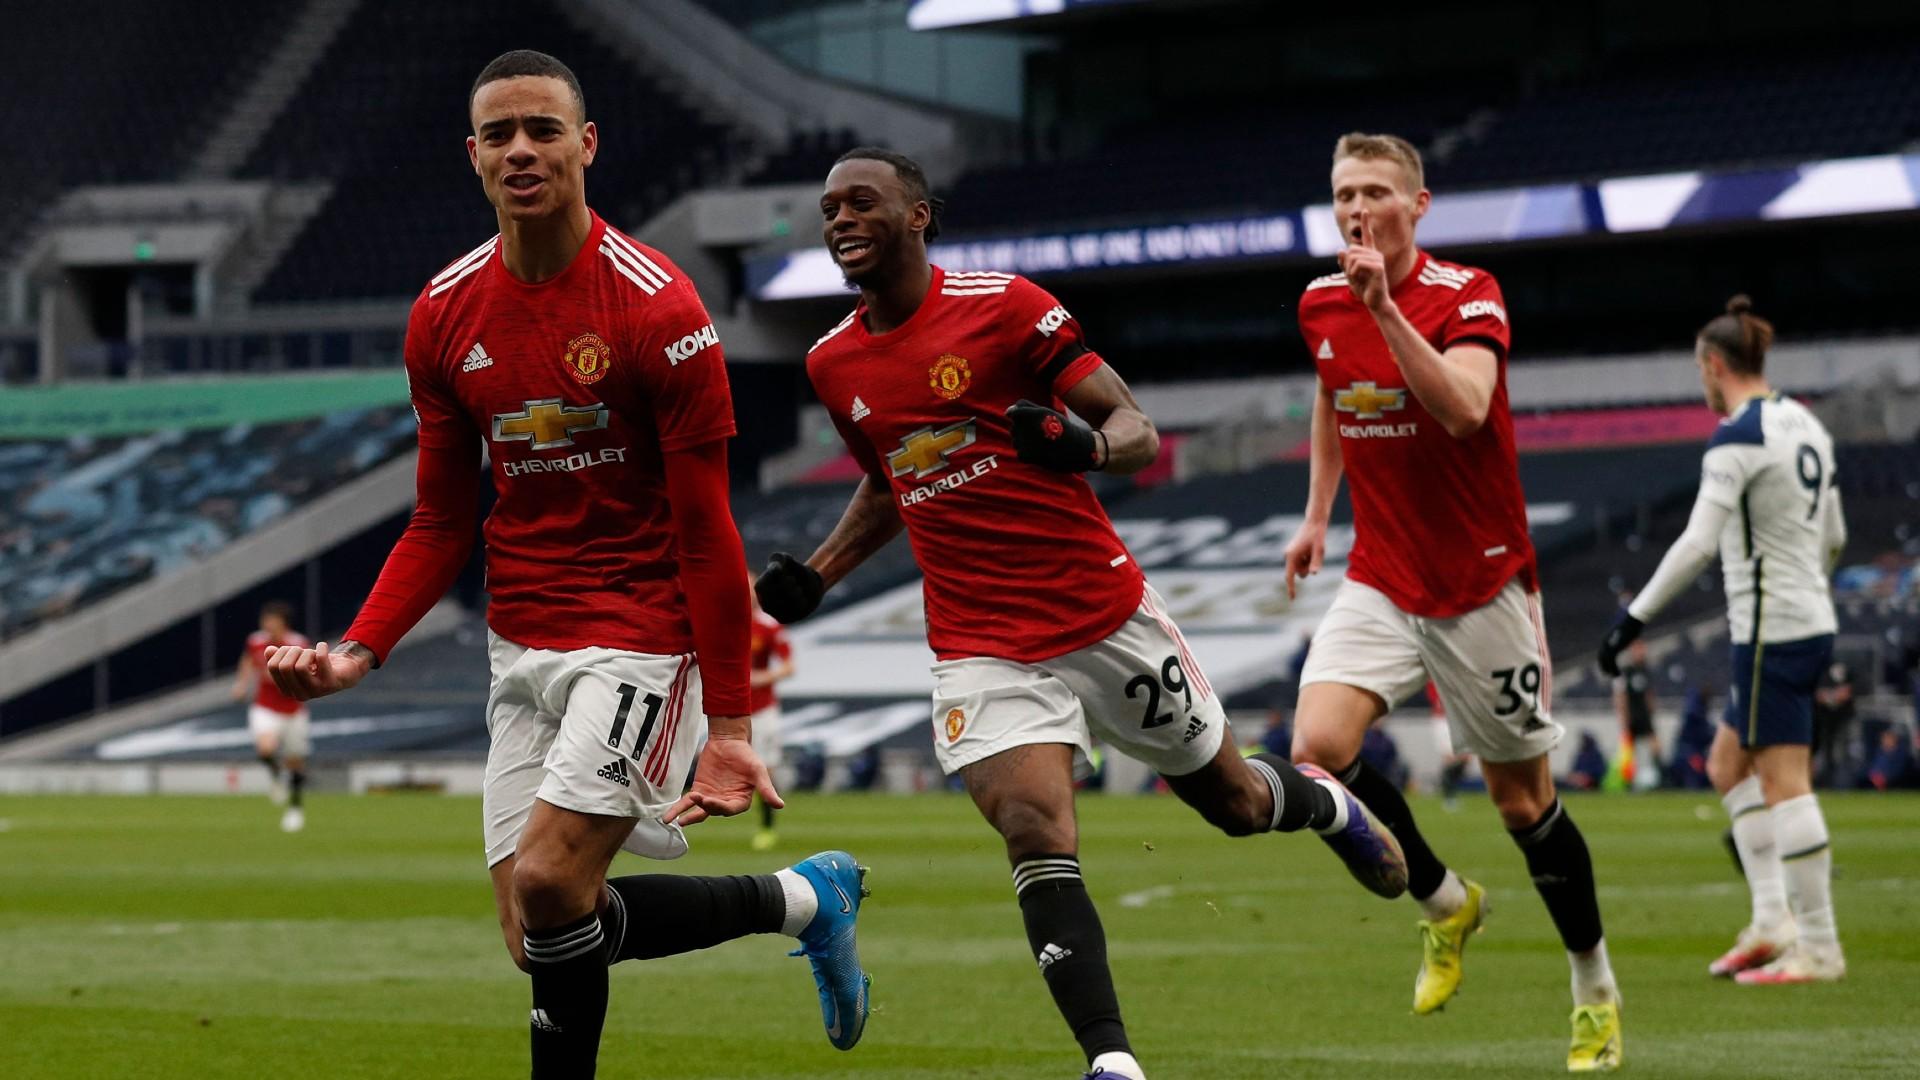 Premier League data dive: Comeback experts Man Utd at it again